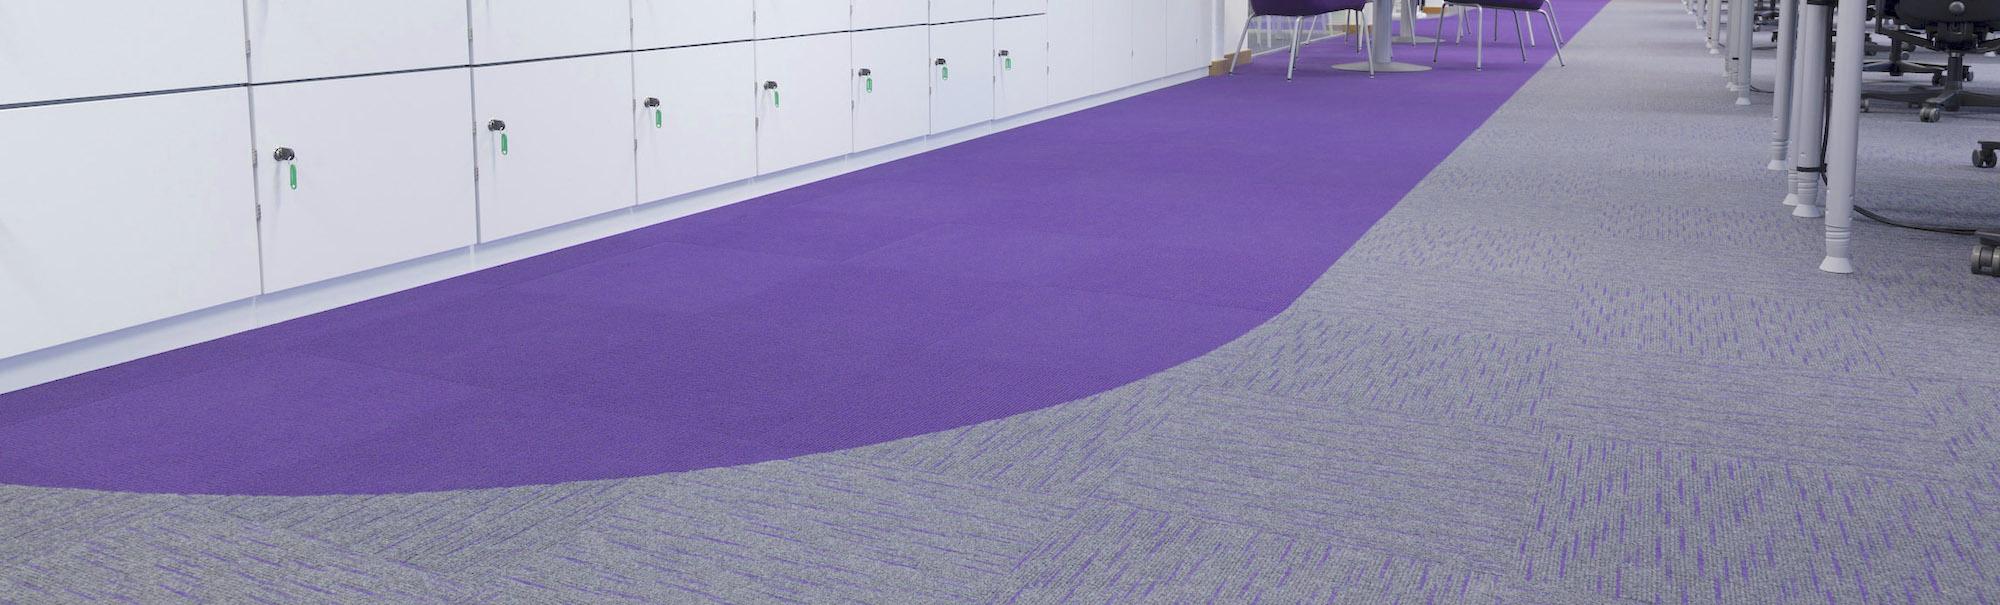 Heckmondwike | Commercial Carpet and Carpet Tiles | Array and Broadrib